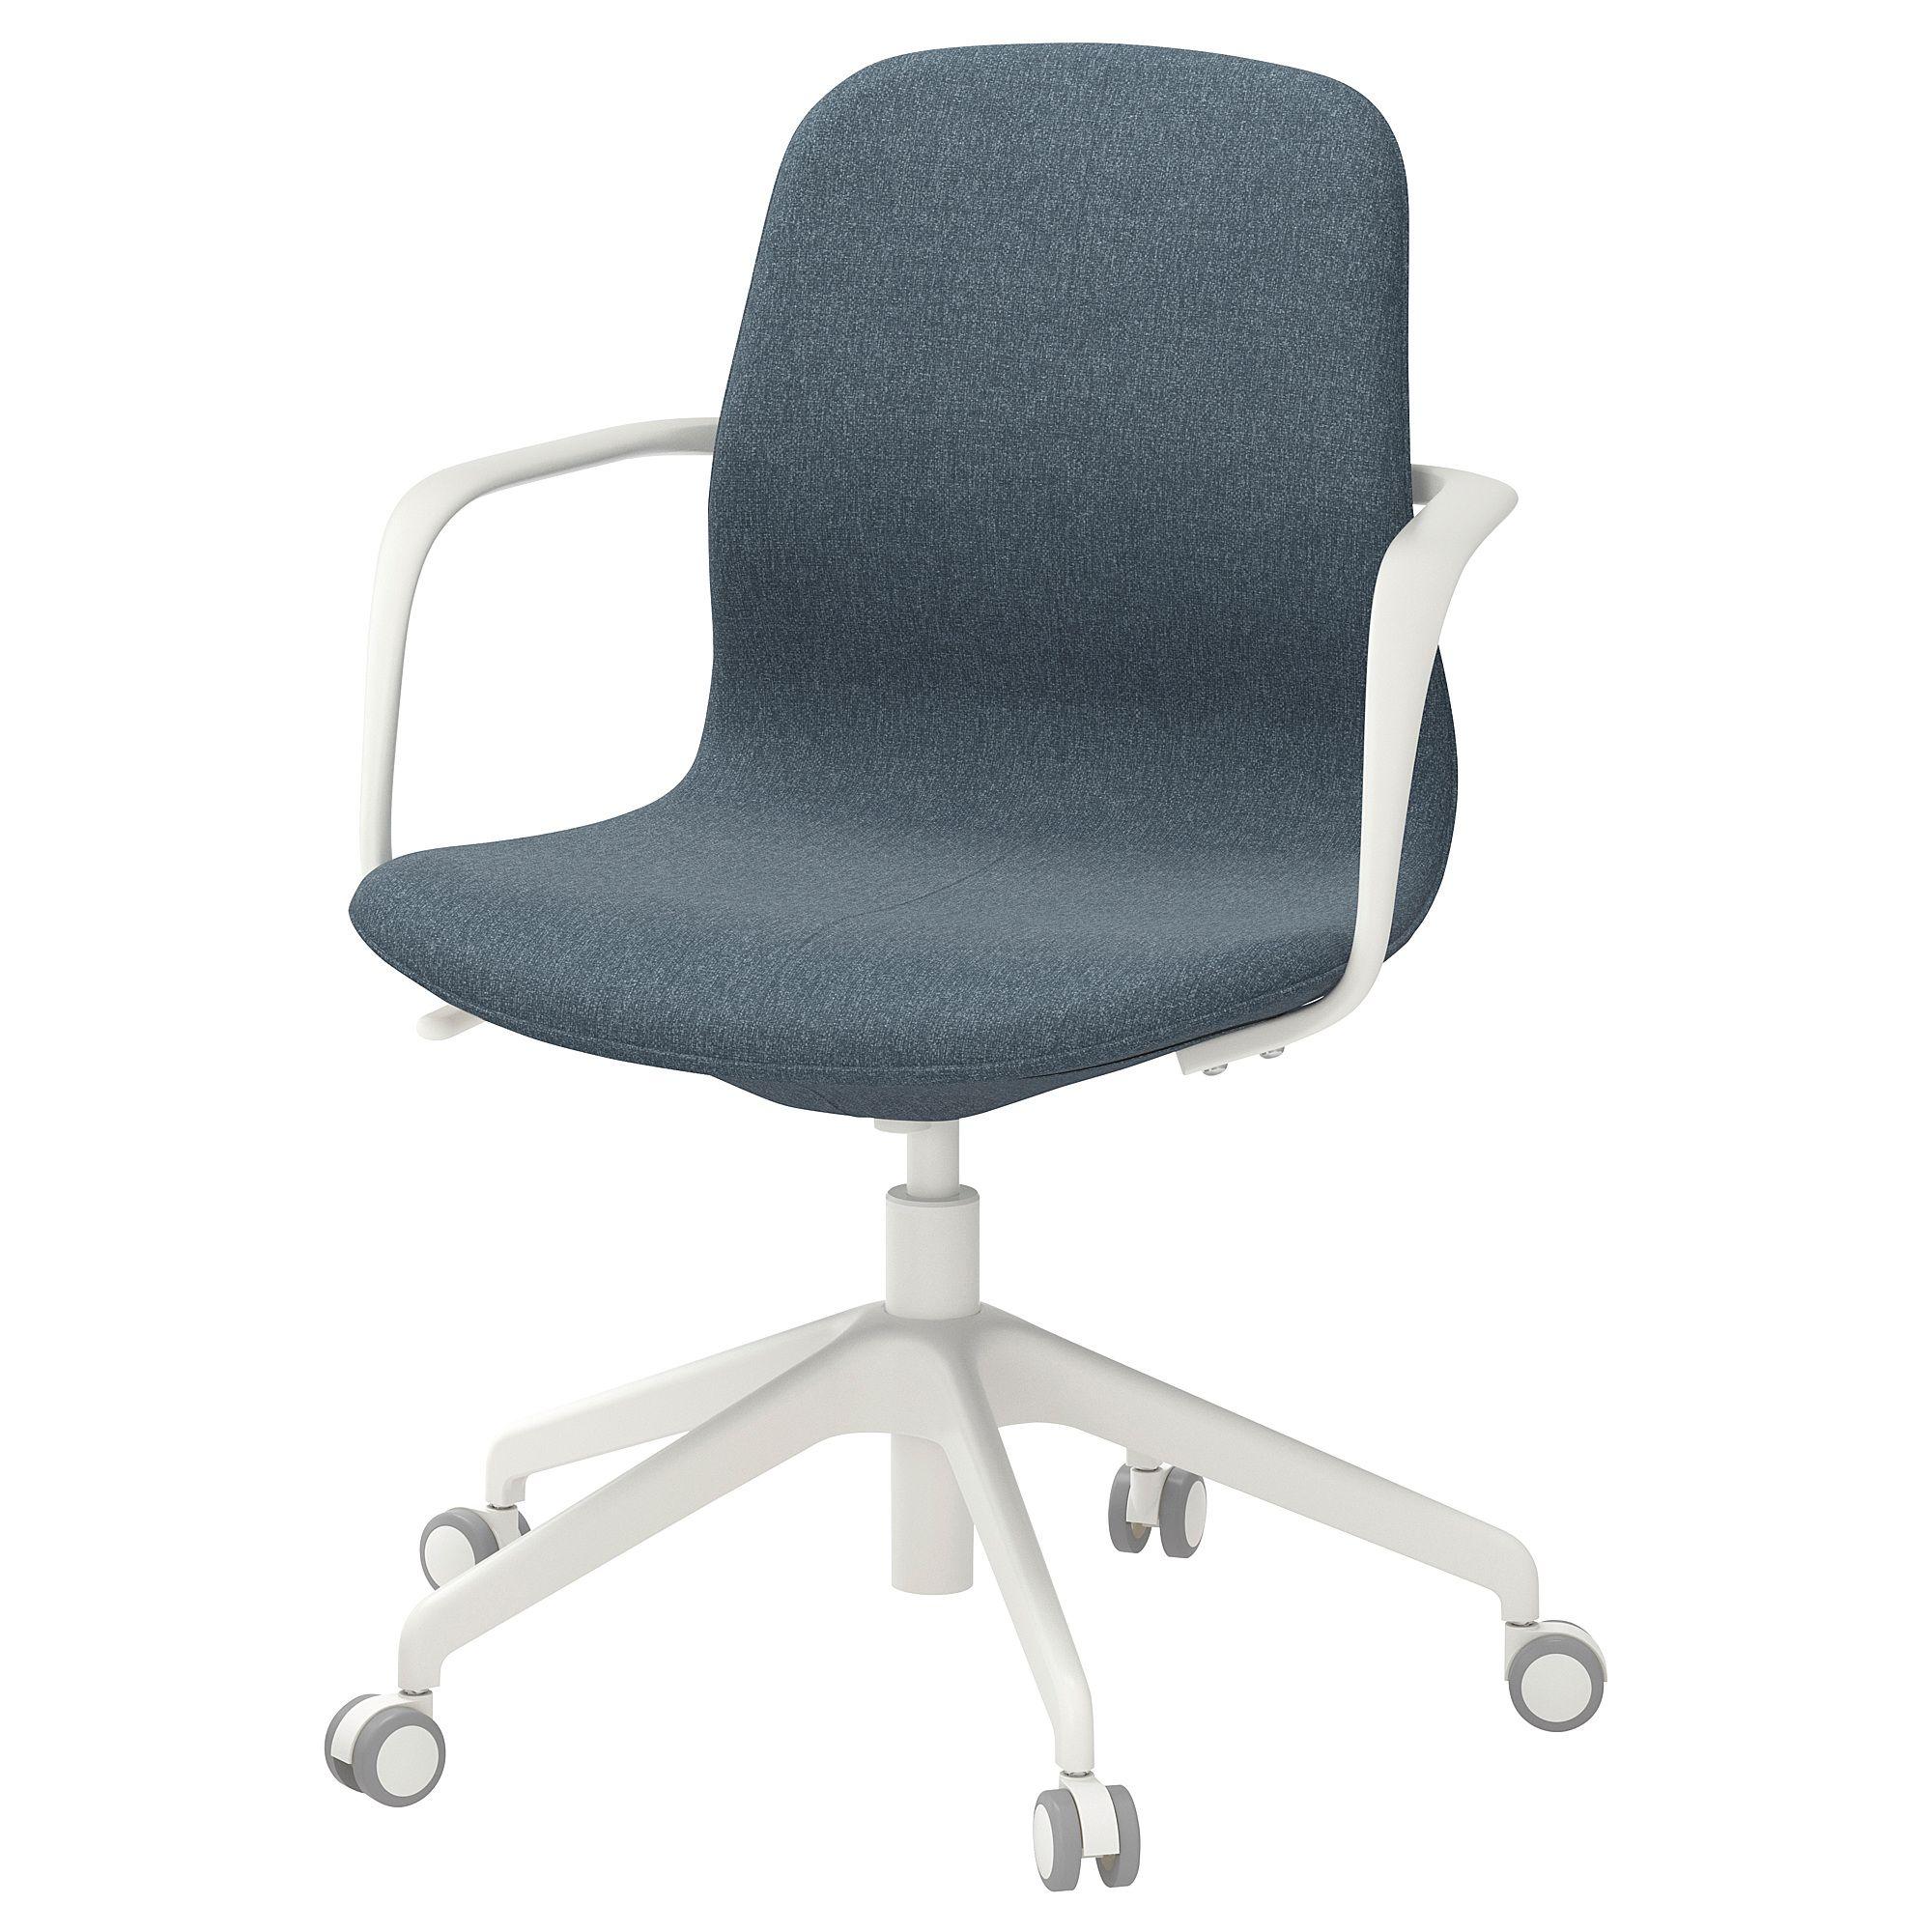 Bürostuhl ikea  IKEA - LÅNGFJÄLL Office chair with armrests Gunnared blue, white in ...